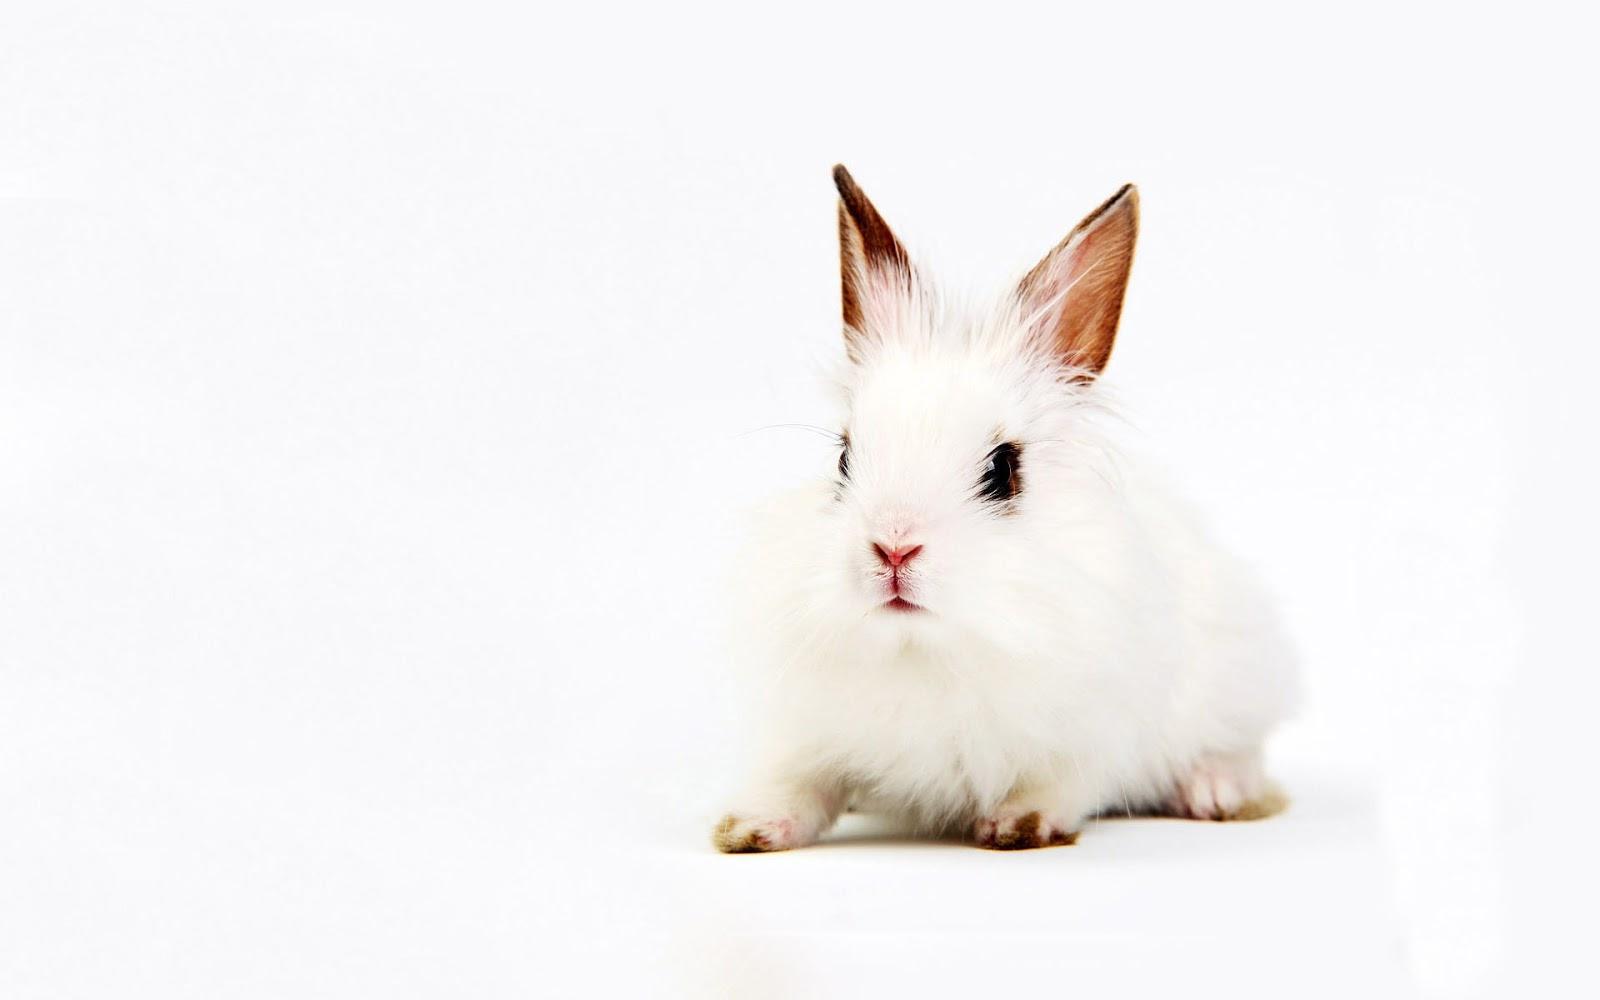 Cute White Rabbit Wallpapers For Desktop: All About Animal Wildlife: Cute White Rabbit HD Wallpapers